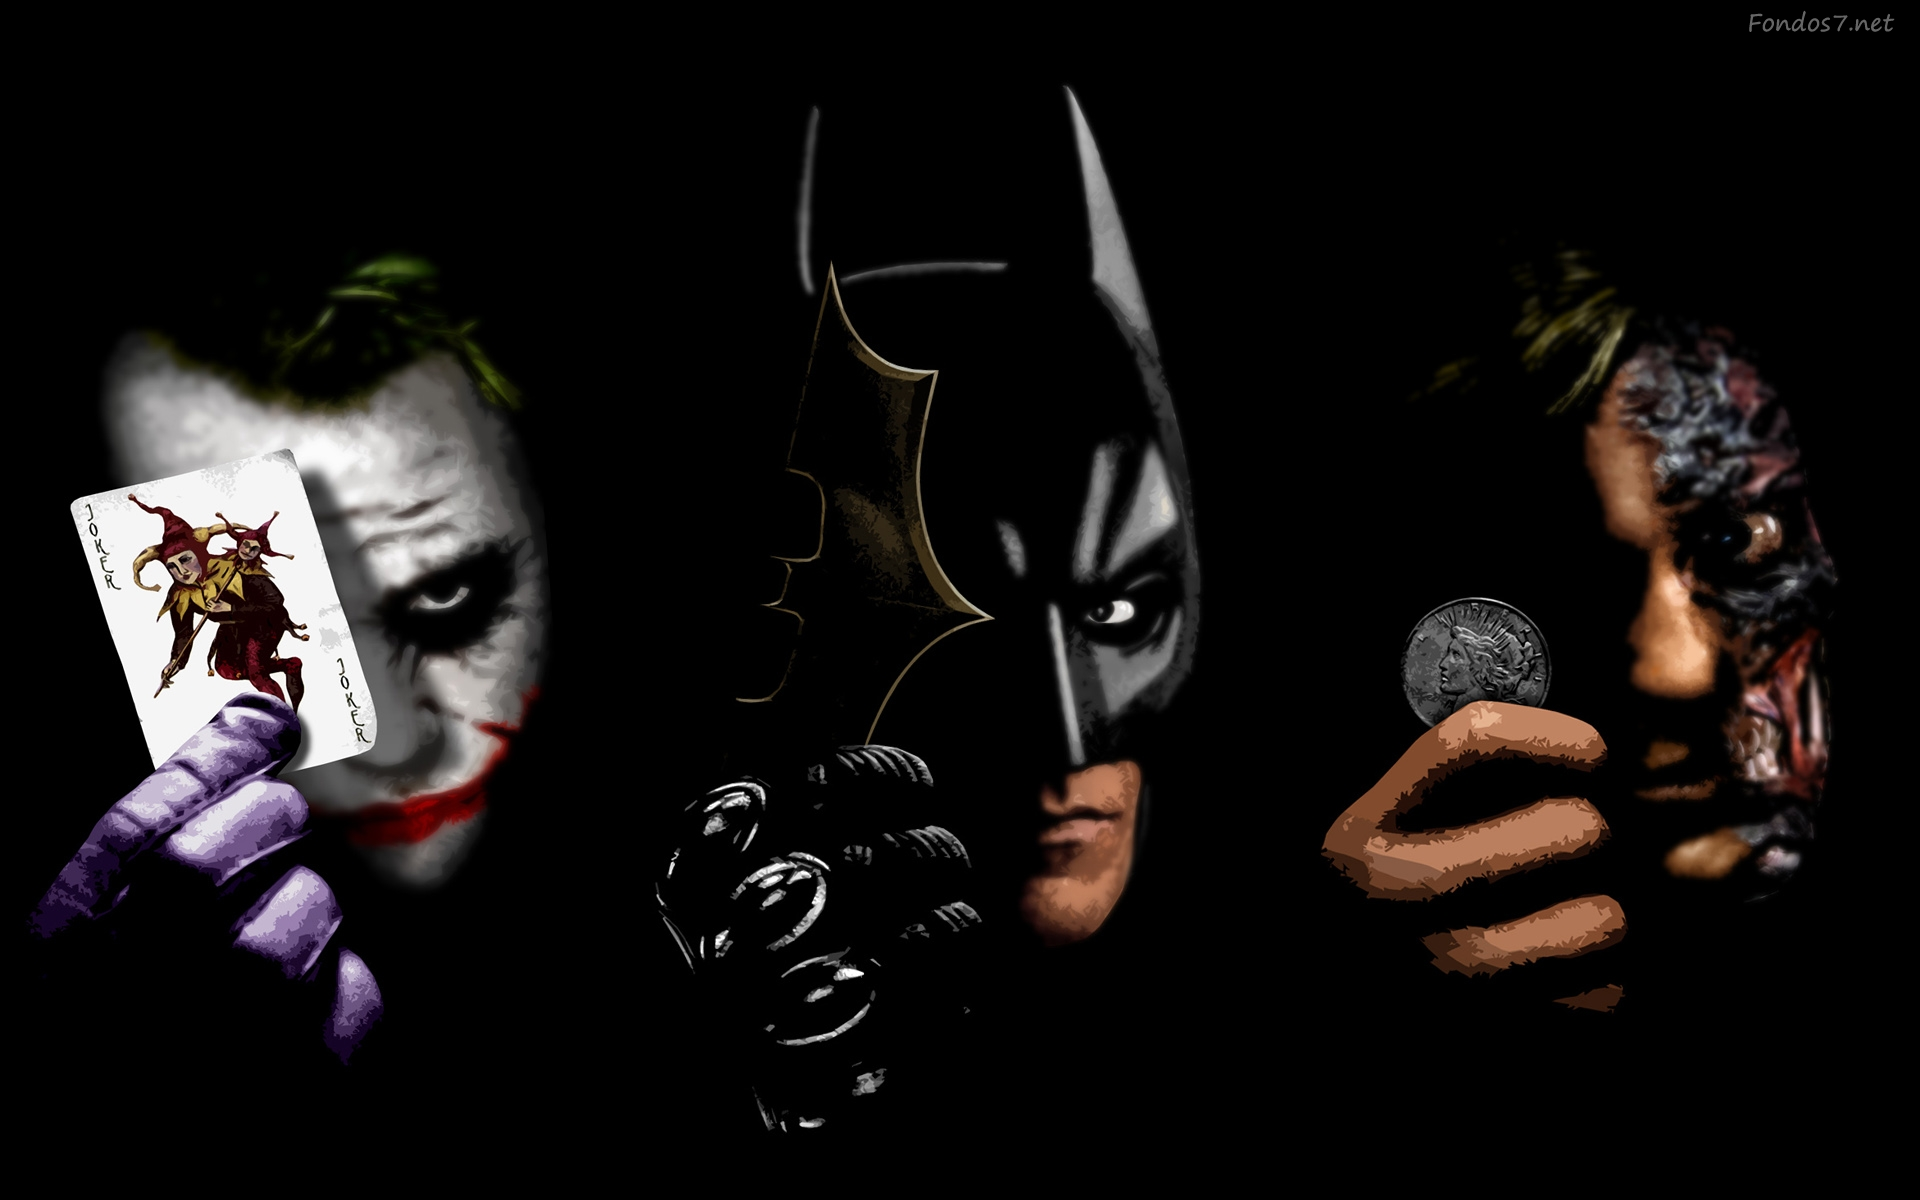 Free Download Batman 3d Hd Wallpapers Wide Screen Wallpaper